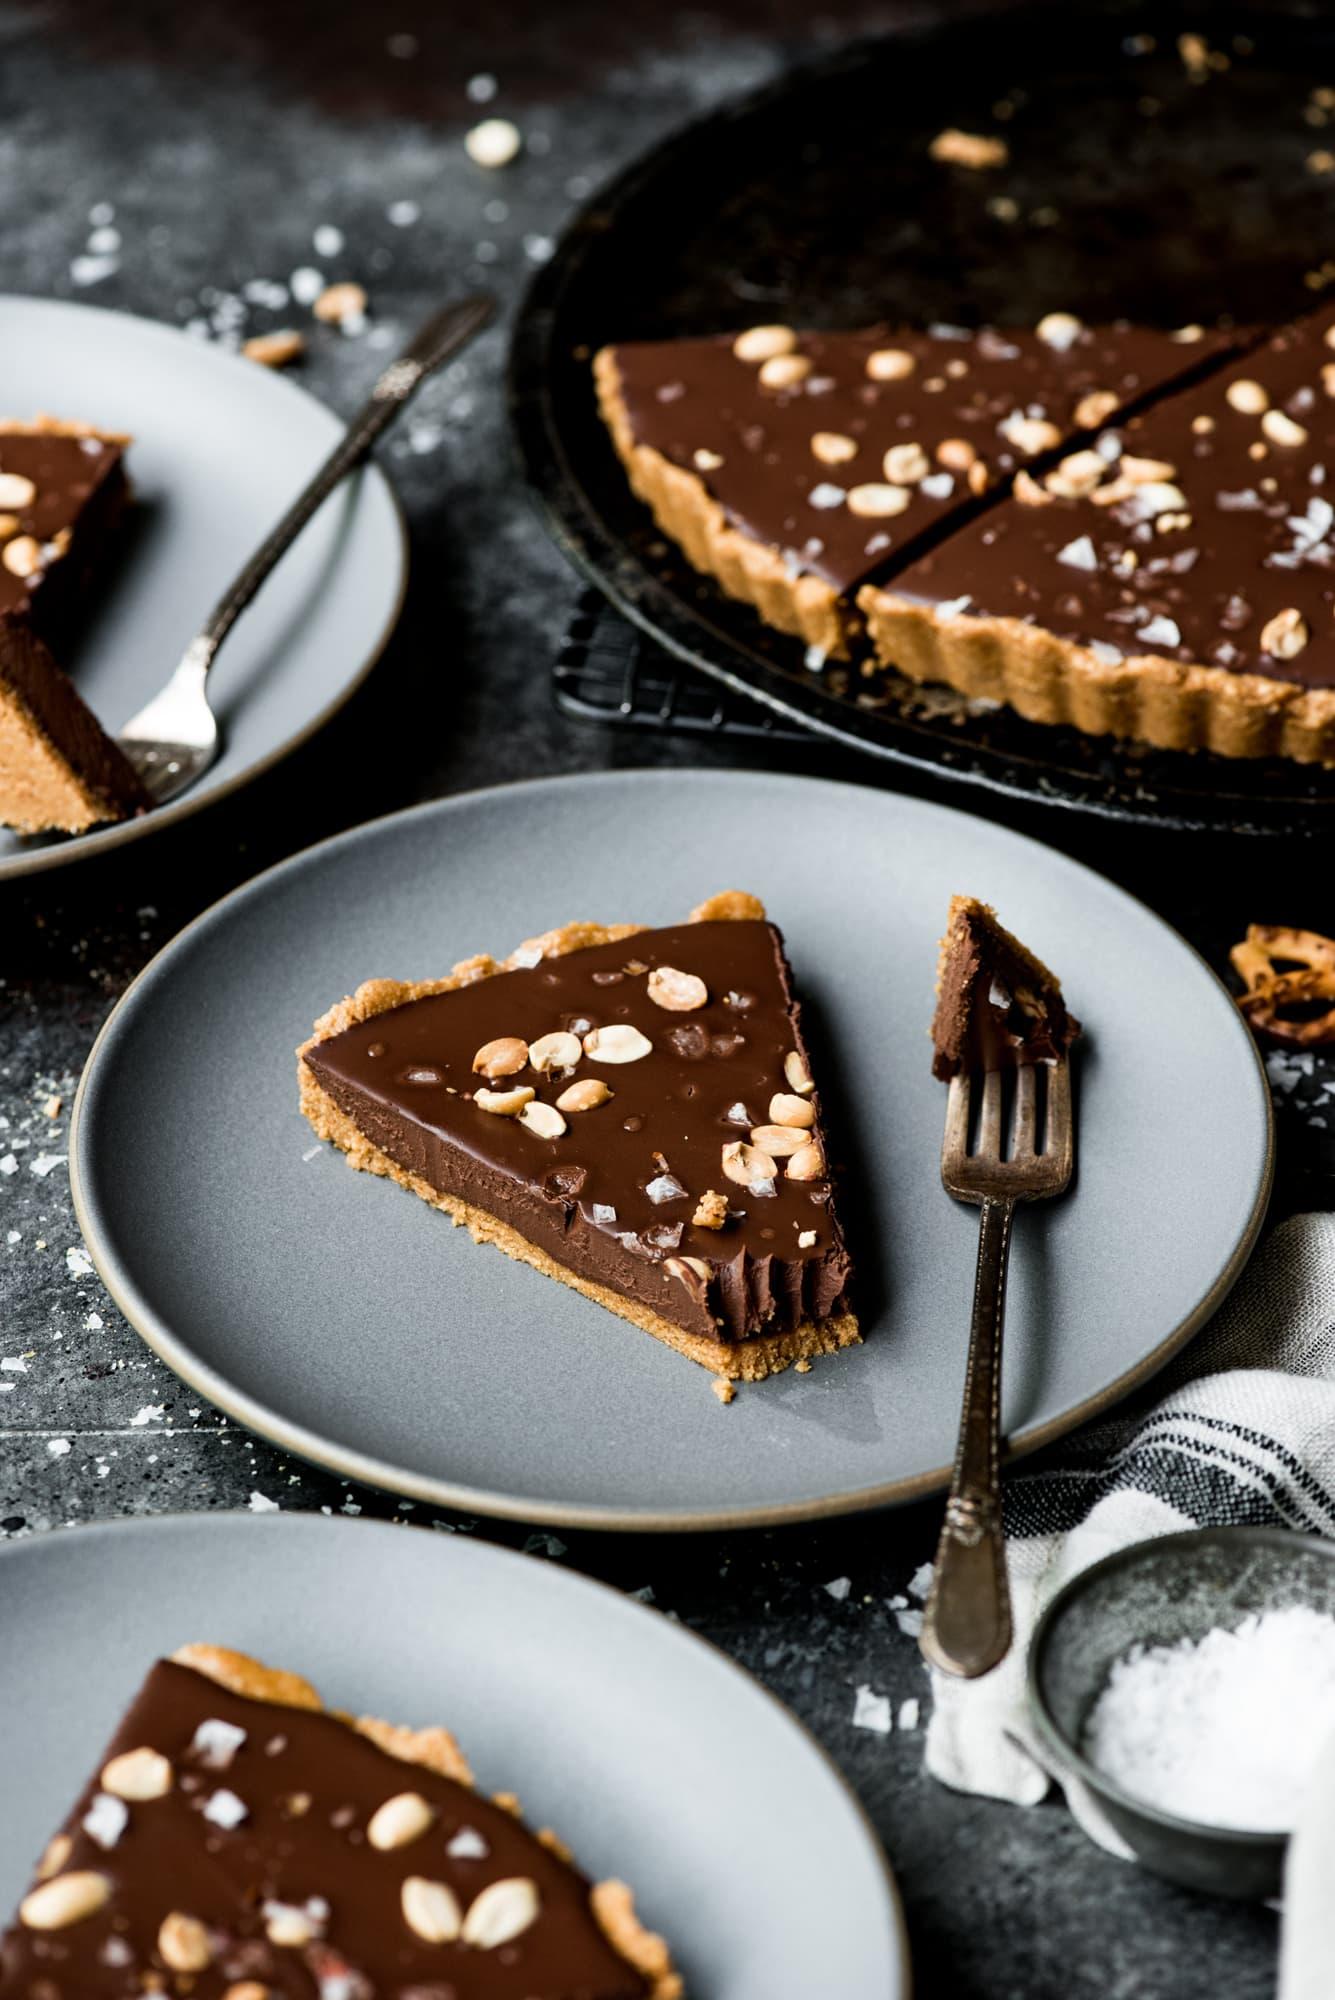 Peanut butter pretzel chocolate tart on a dark plate with fork